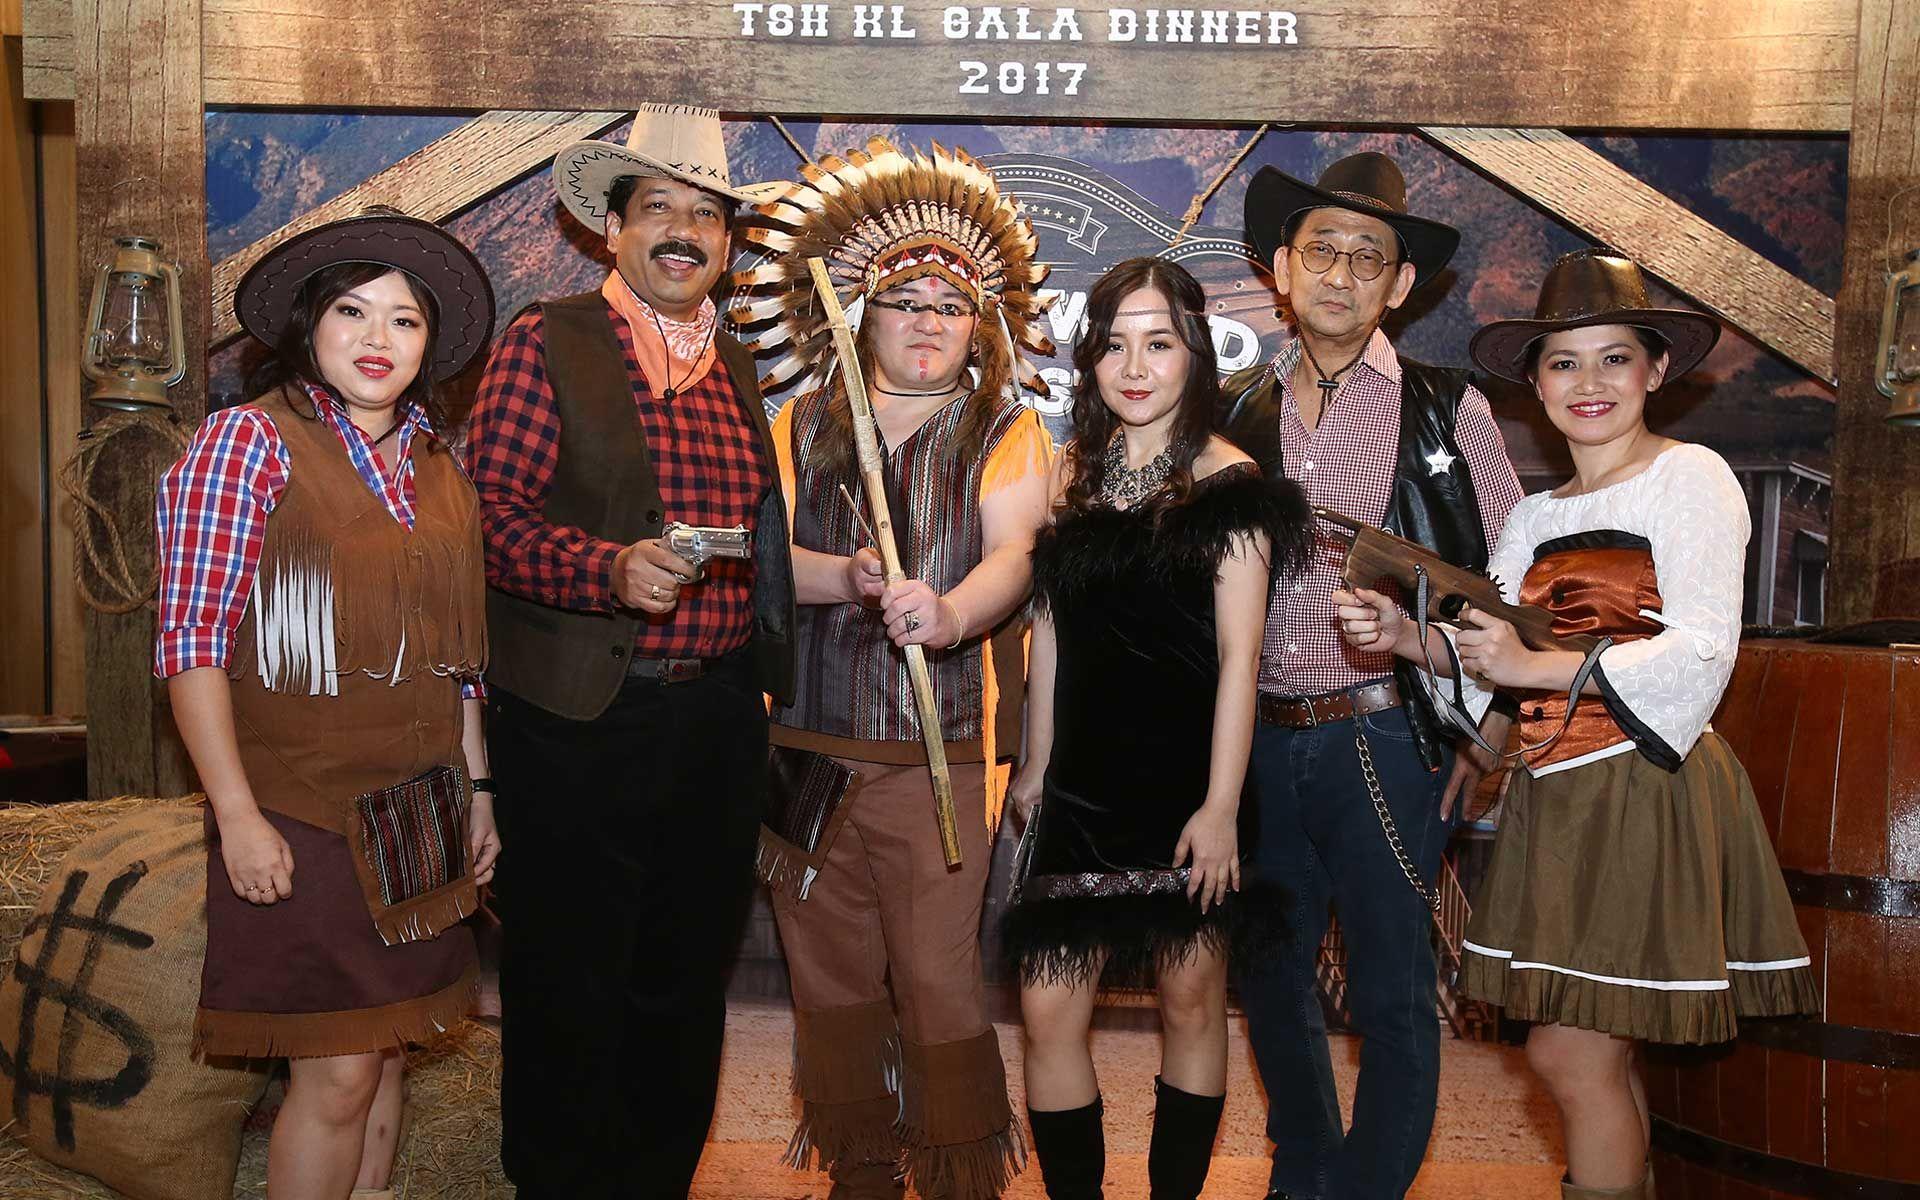 Kathryn Tan, Thambirajan Pillai, Sam Ang, Jean Cheng, William Tan and Carmen Low